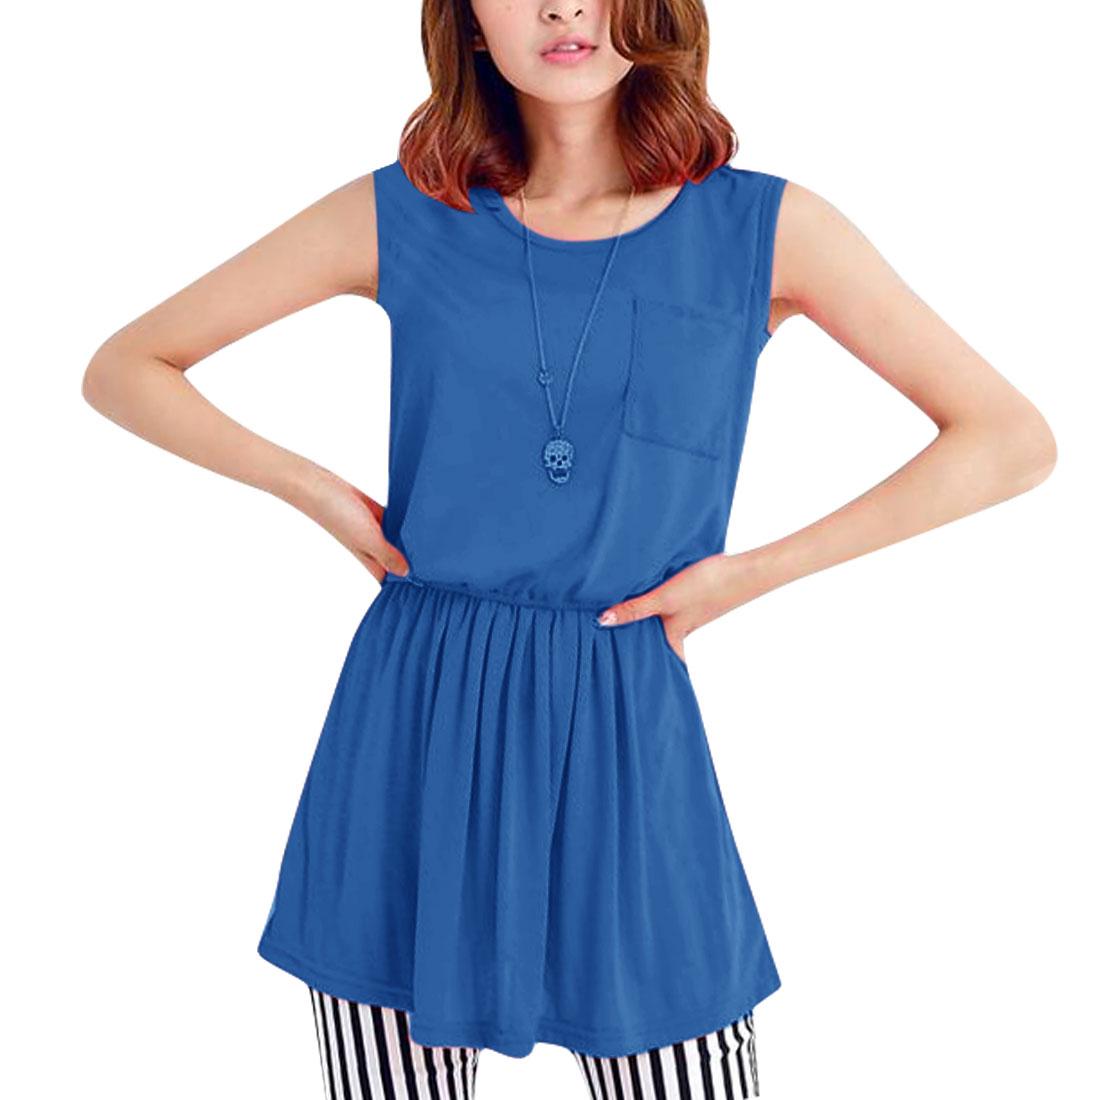 Ladies Round Neck Sleeveless Crochet Tank Dress Royal Blue XS